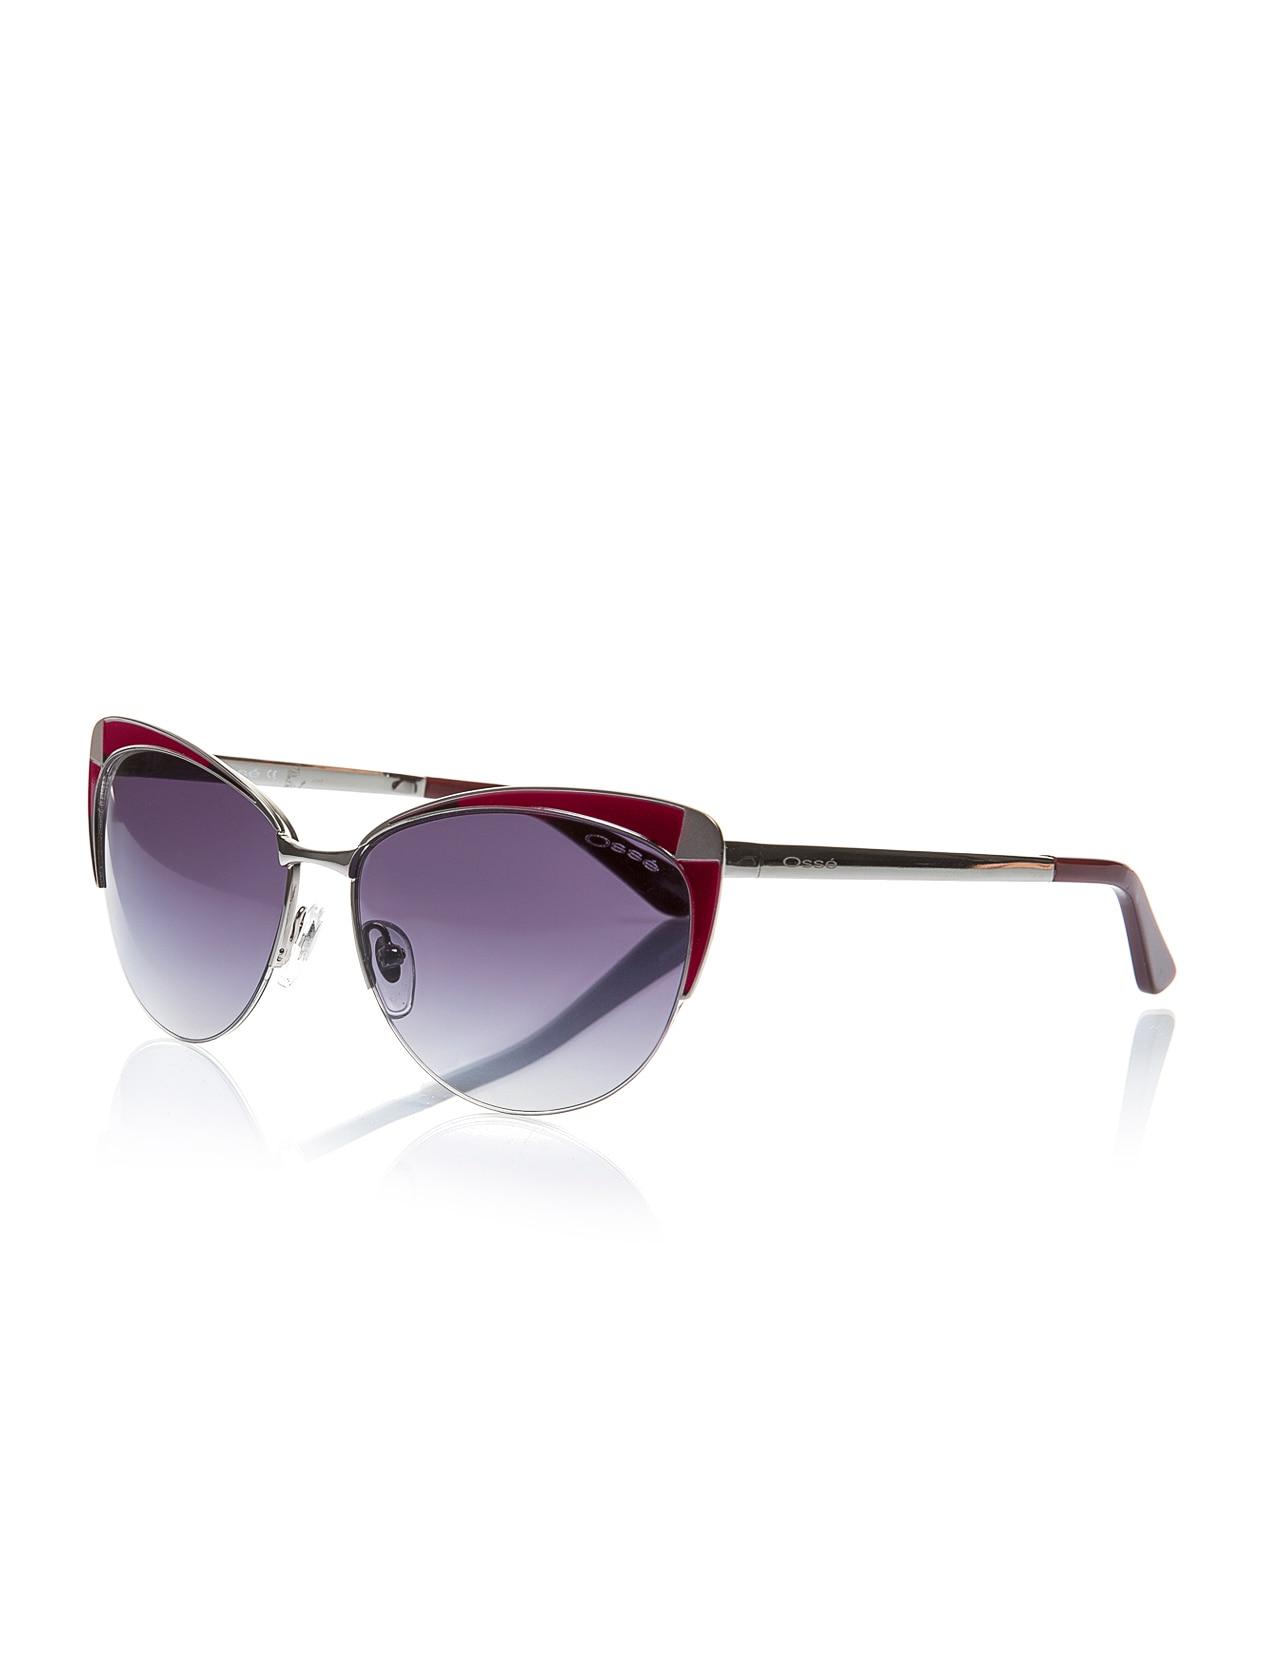 Women's sunglasses os 2334 04 metal silver organic 58 -- osse